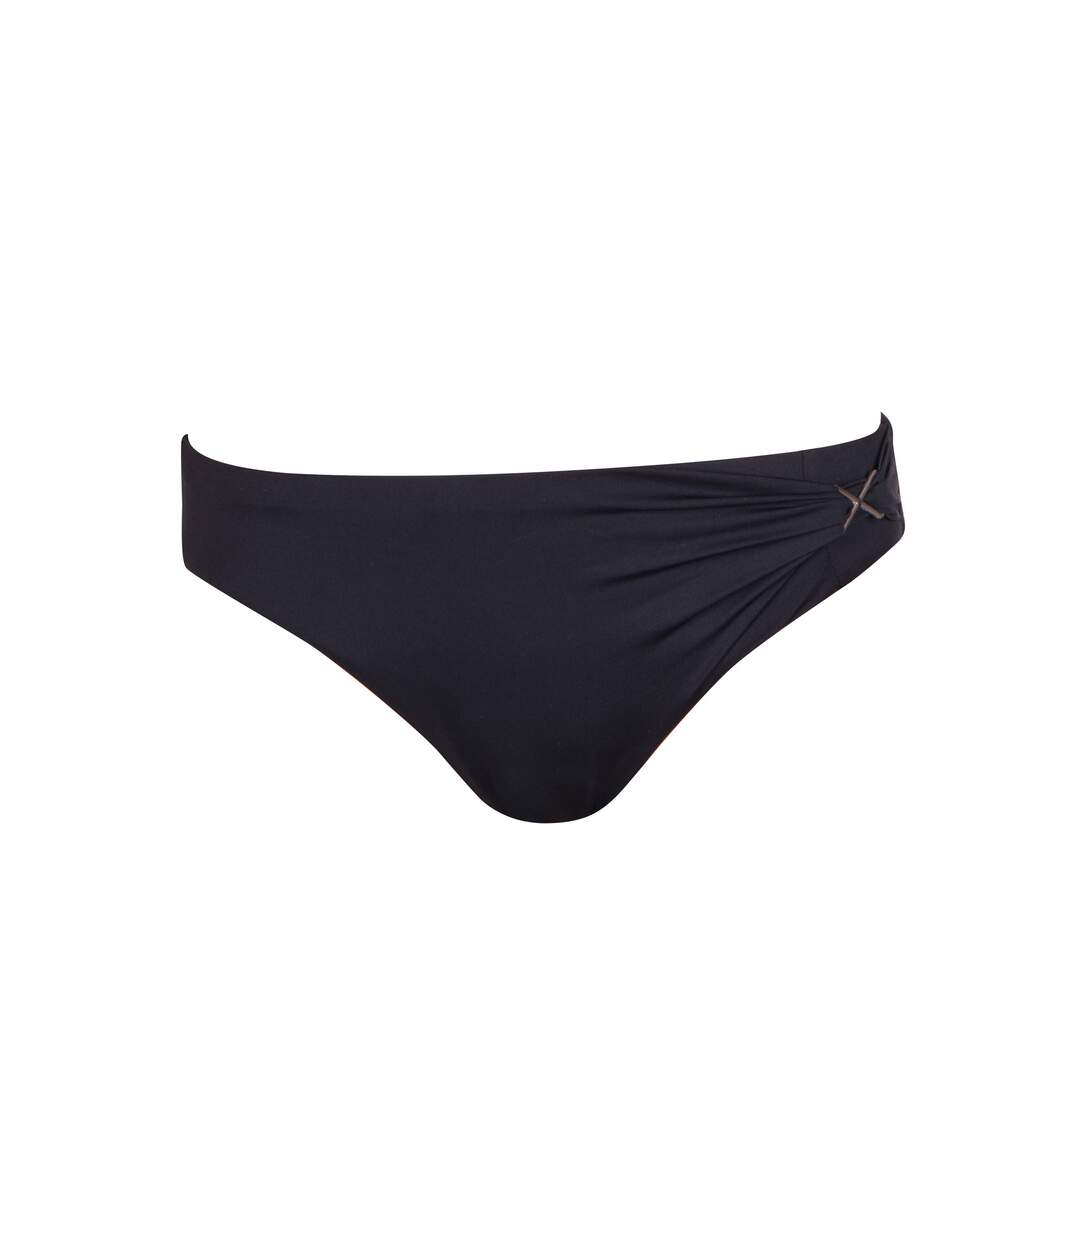 Dégagement Bas de maillot de bain Gran Canaria Lisca noir dsf.d455nksdKLFHG